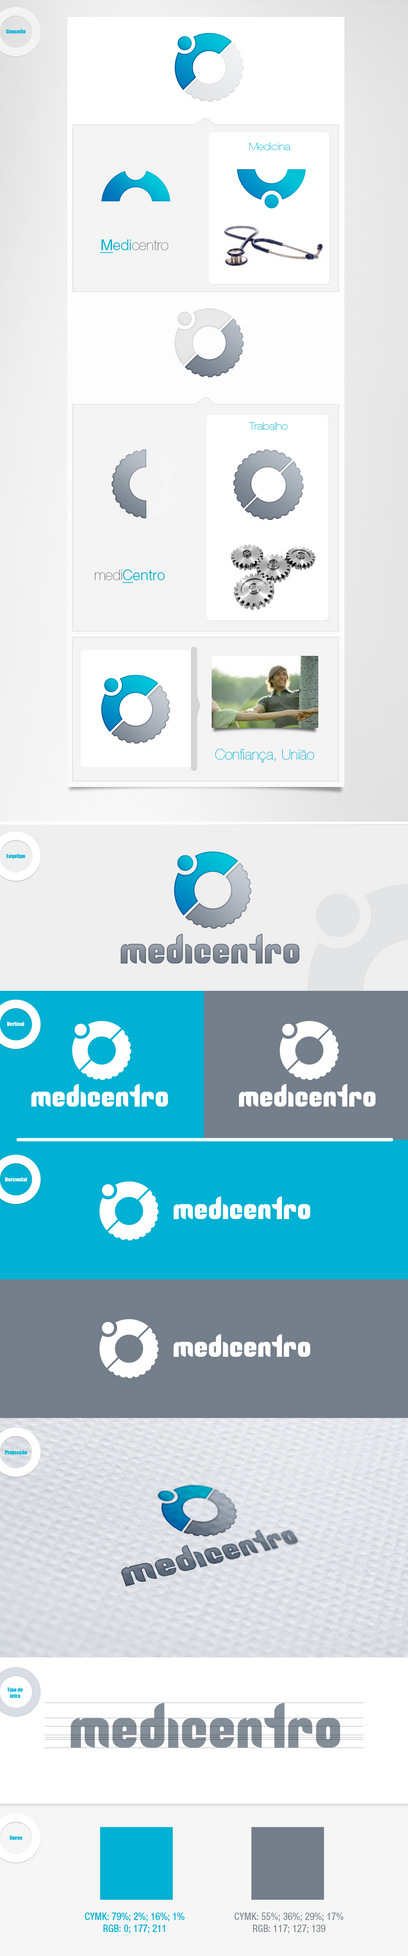 Medicentro 3 logo by devzign